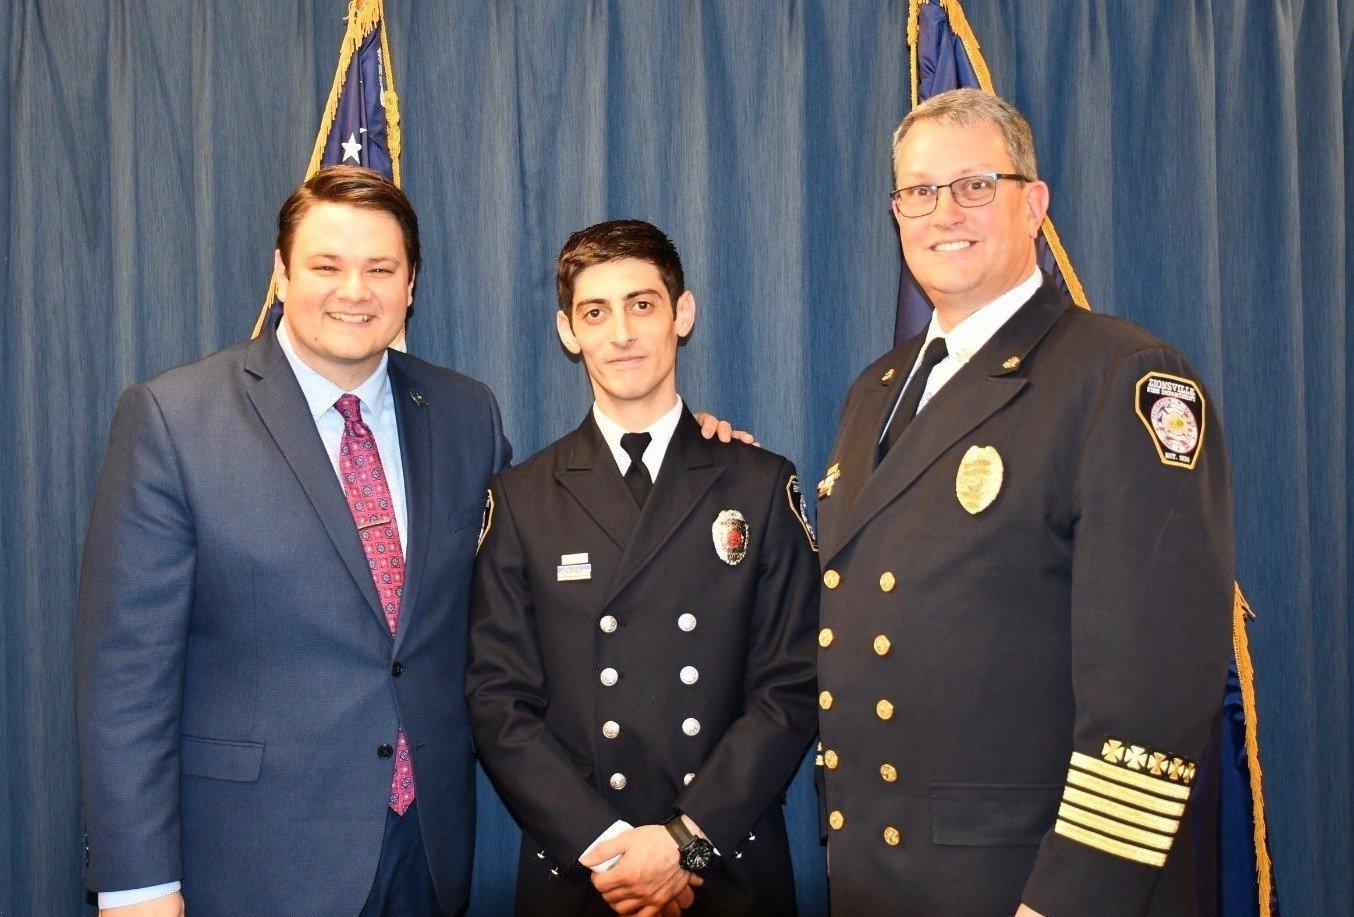 (from left to right): Sen. Ford, Firefighter Paramedic Abdullakh Abamislimov, Chief James VanGorder